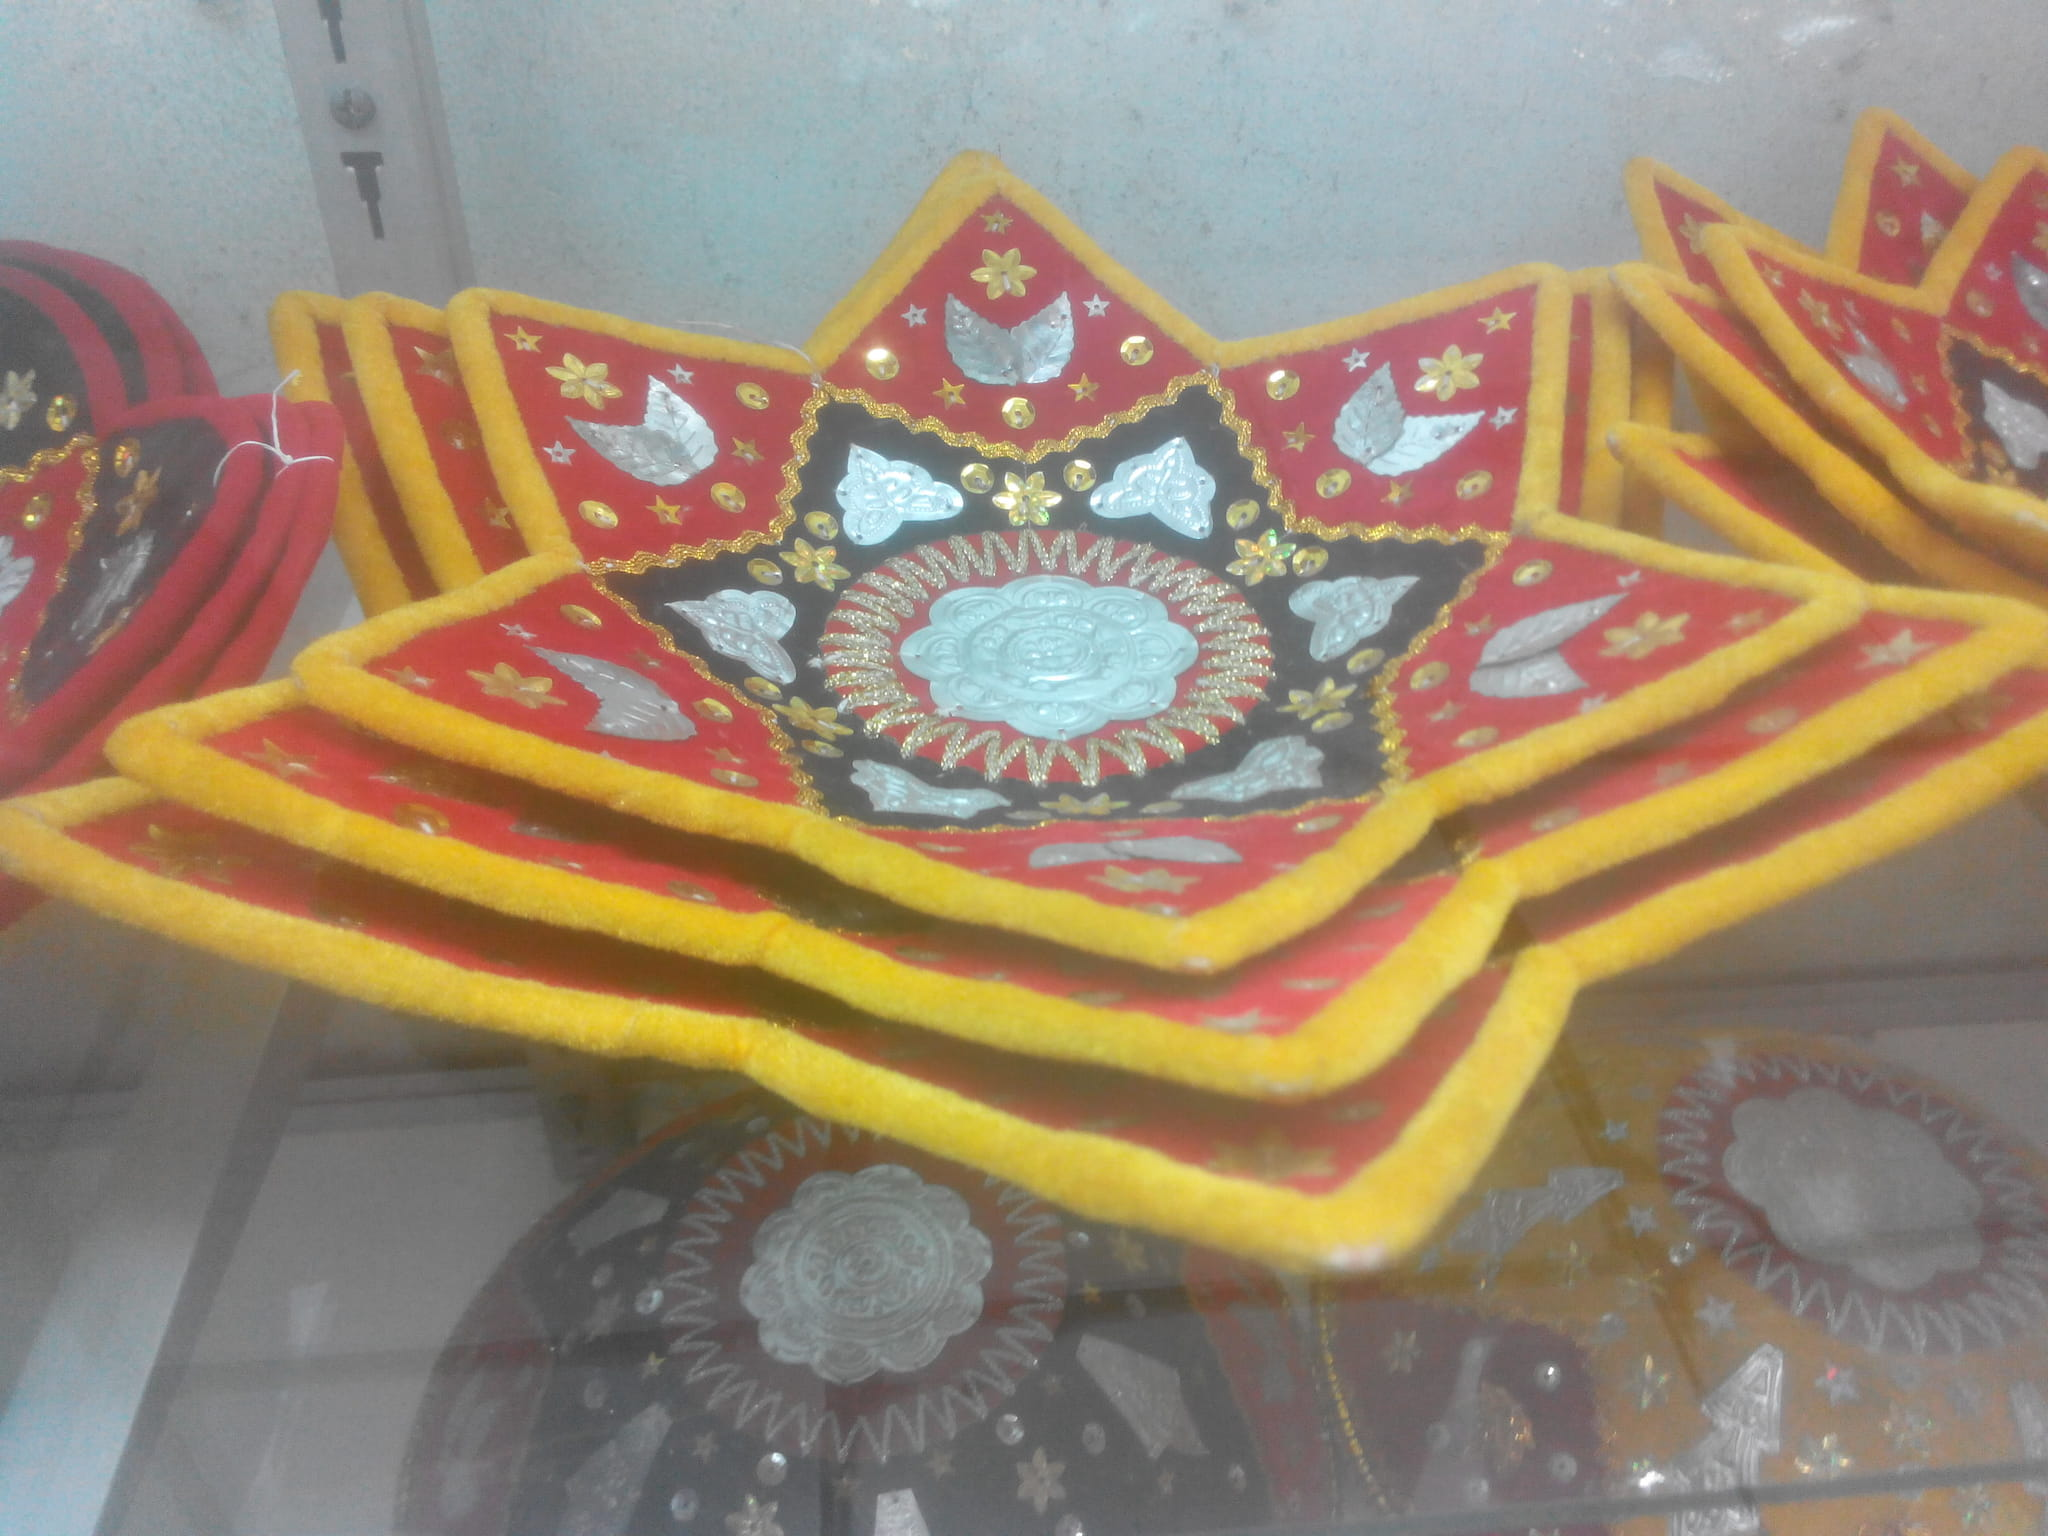 Kalimantan Souvenir Pajangan Dinding Dayak Daftar Update Harga Ck Bandana 1409018 Multifungsi Motif Aneka Dan Oleh Khas Hiasan